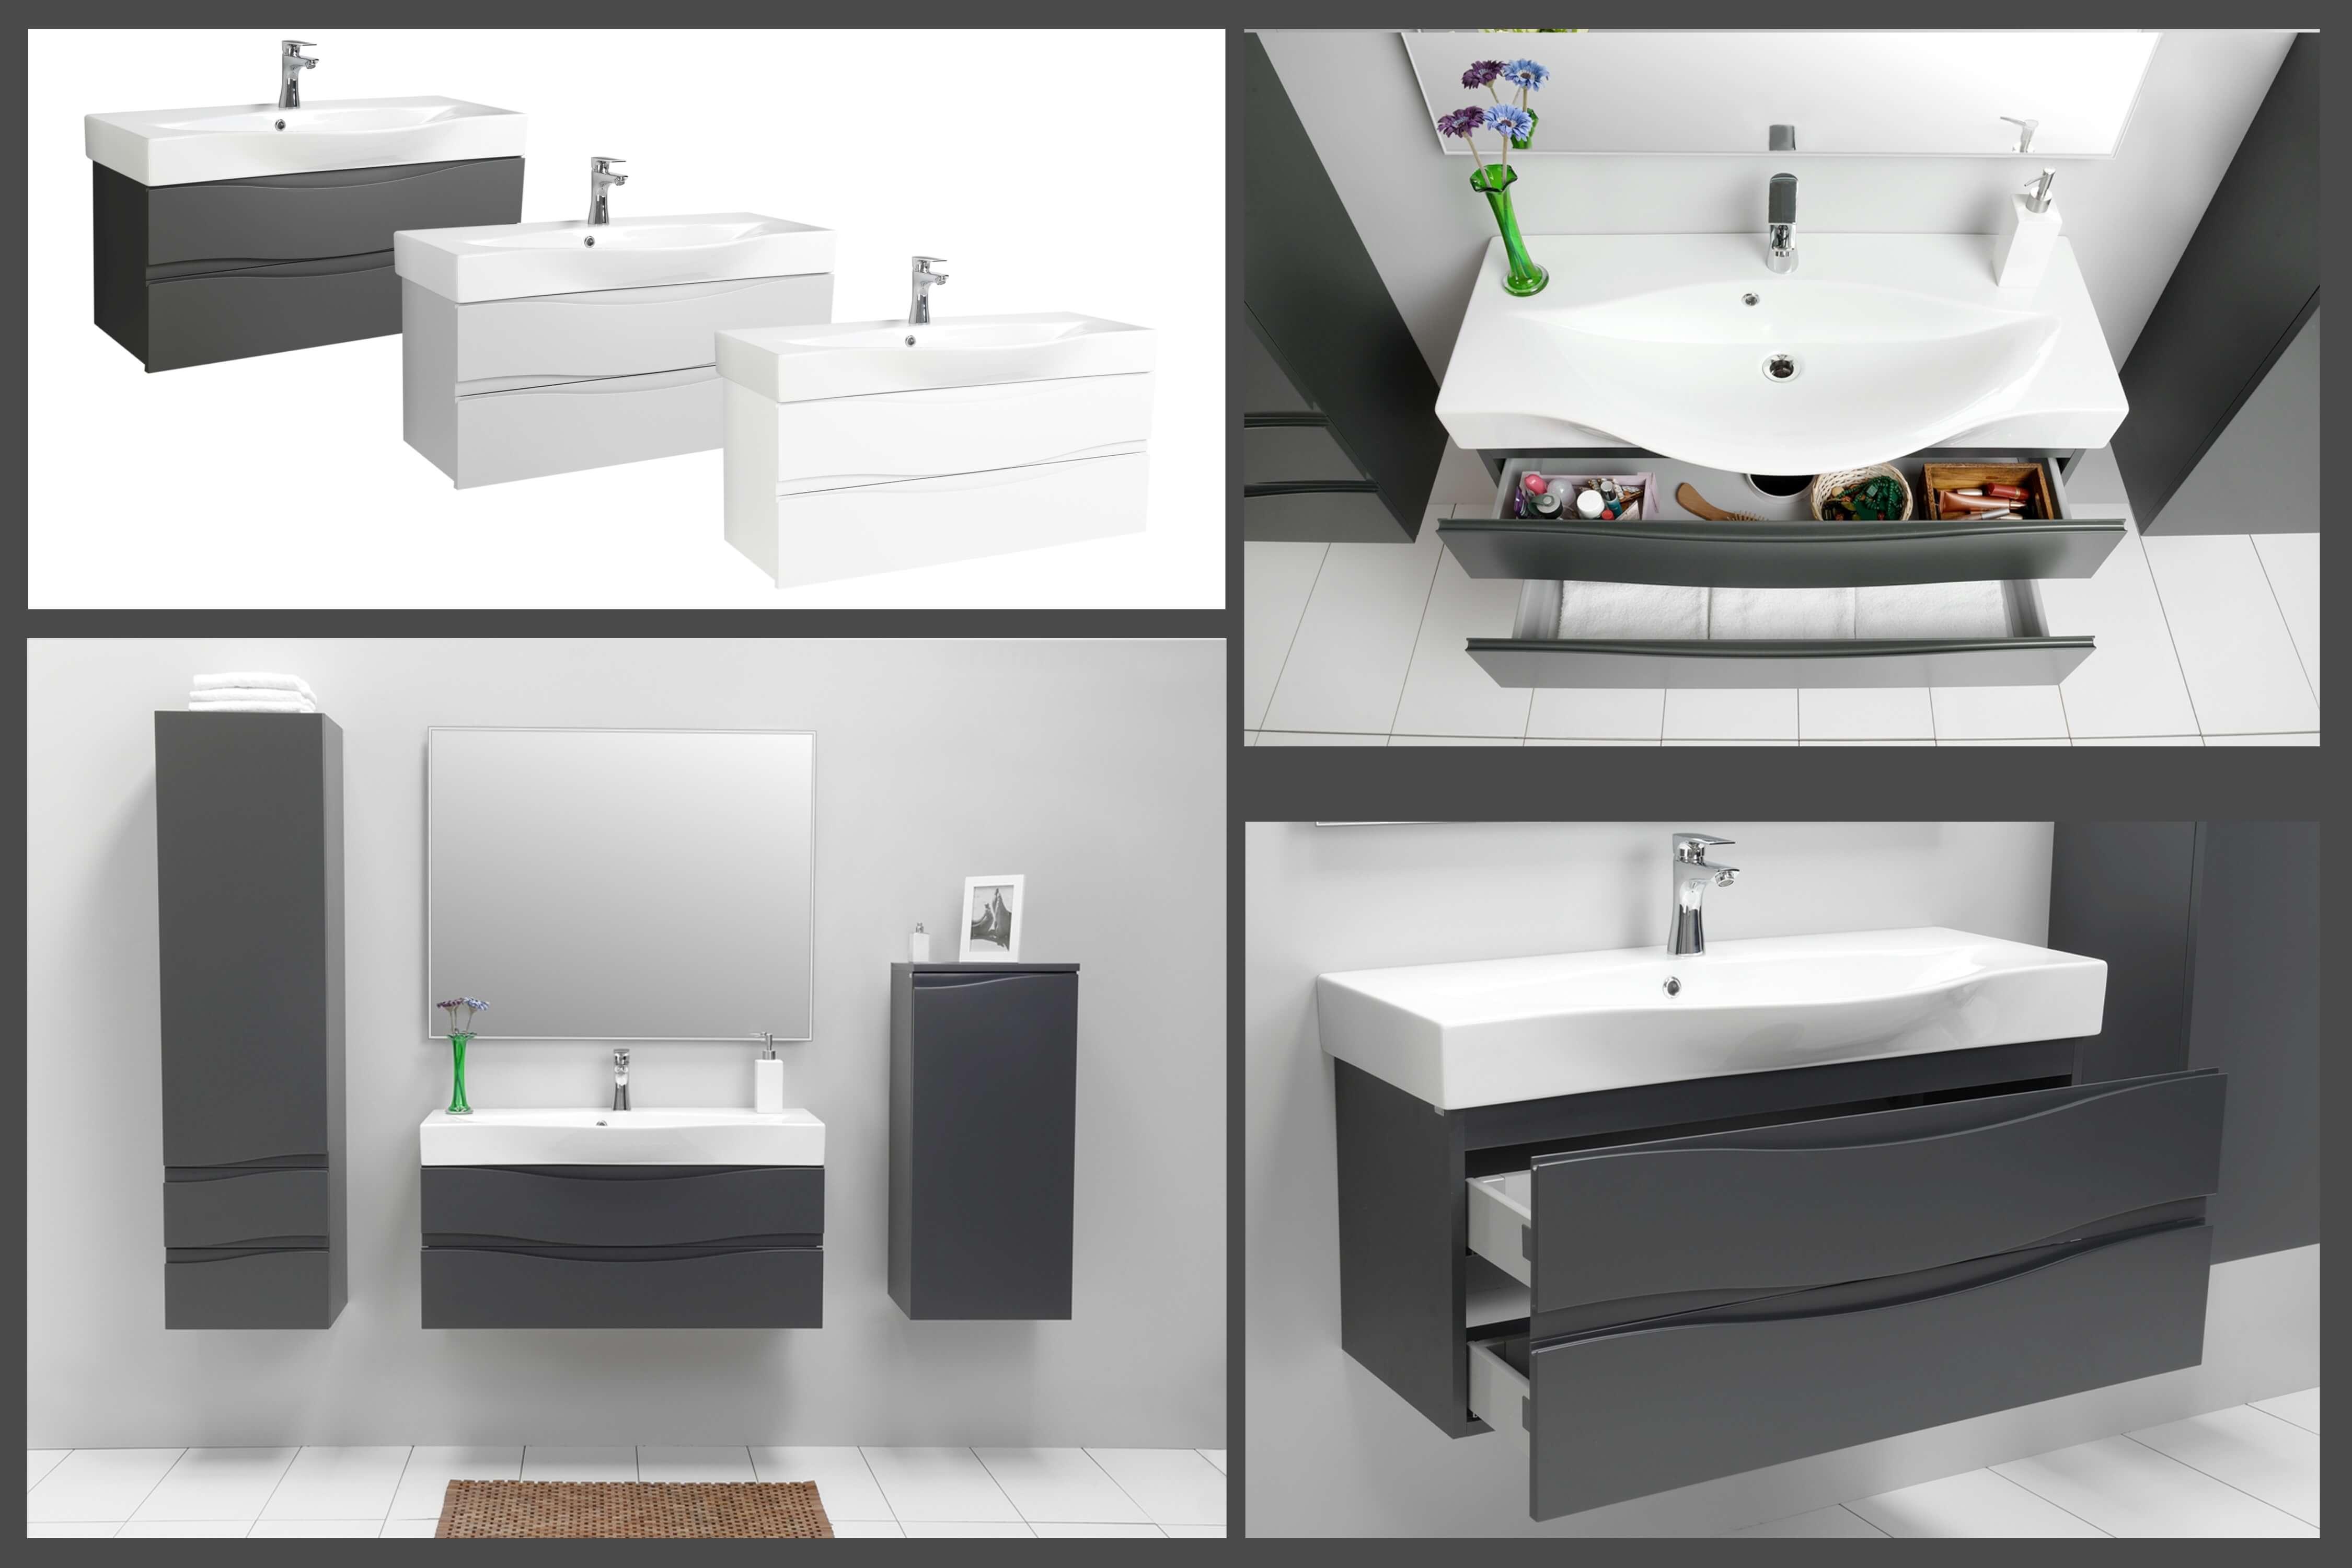 badezimmerm bel badm bel set waschtisch hochschrank. Black Bedroom Furniture Sets. Home Design Ideas